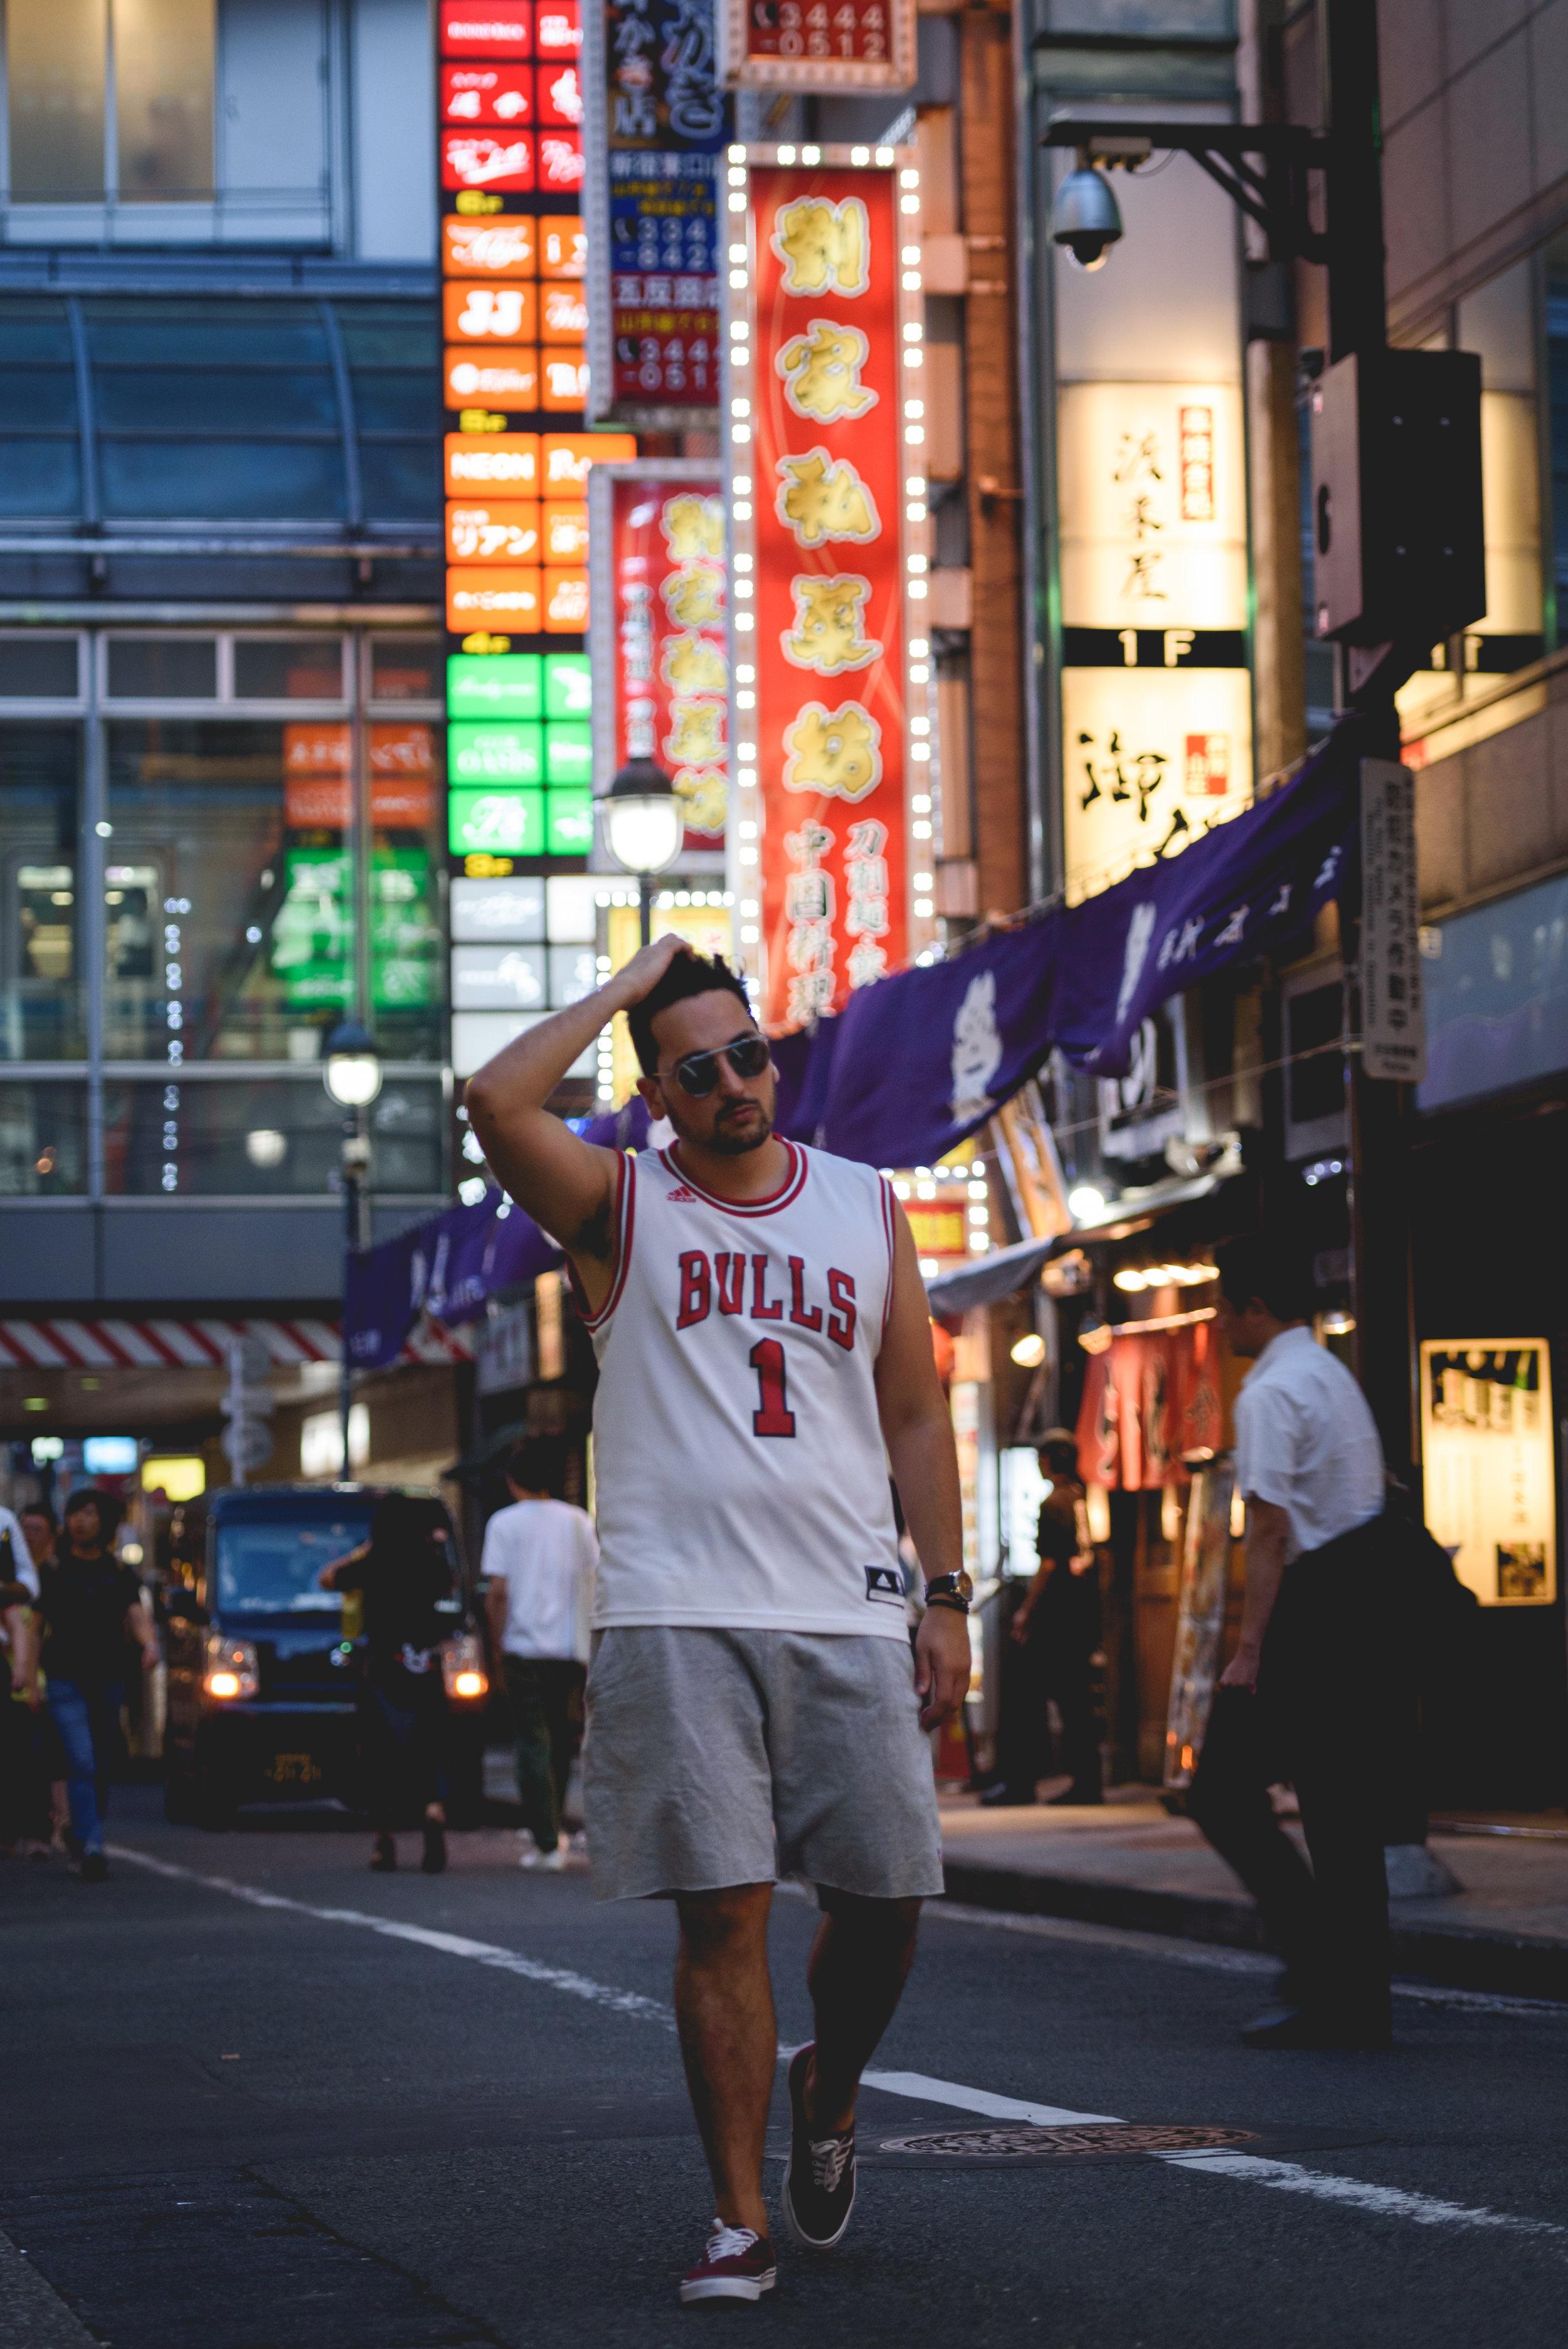 2018-09-05 Fotos na Mala Tokyo - Thais & Estevam -10.jpg